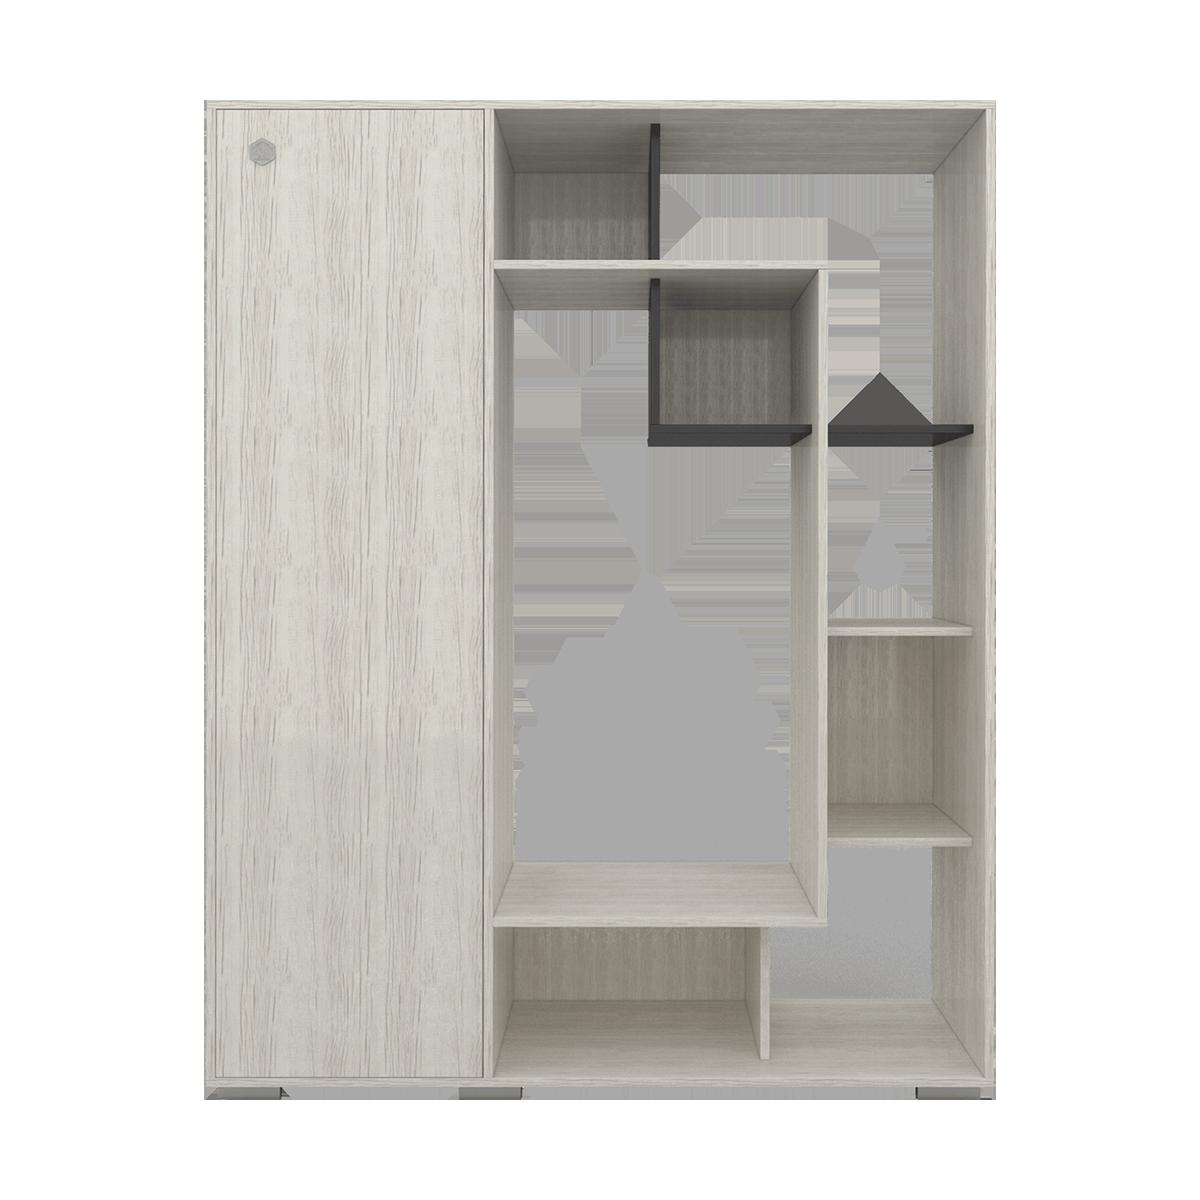 Офисный шкаф-стеллаж KULIK SYSTEM SPHERE